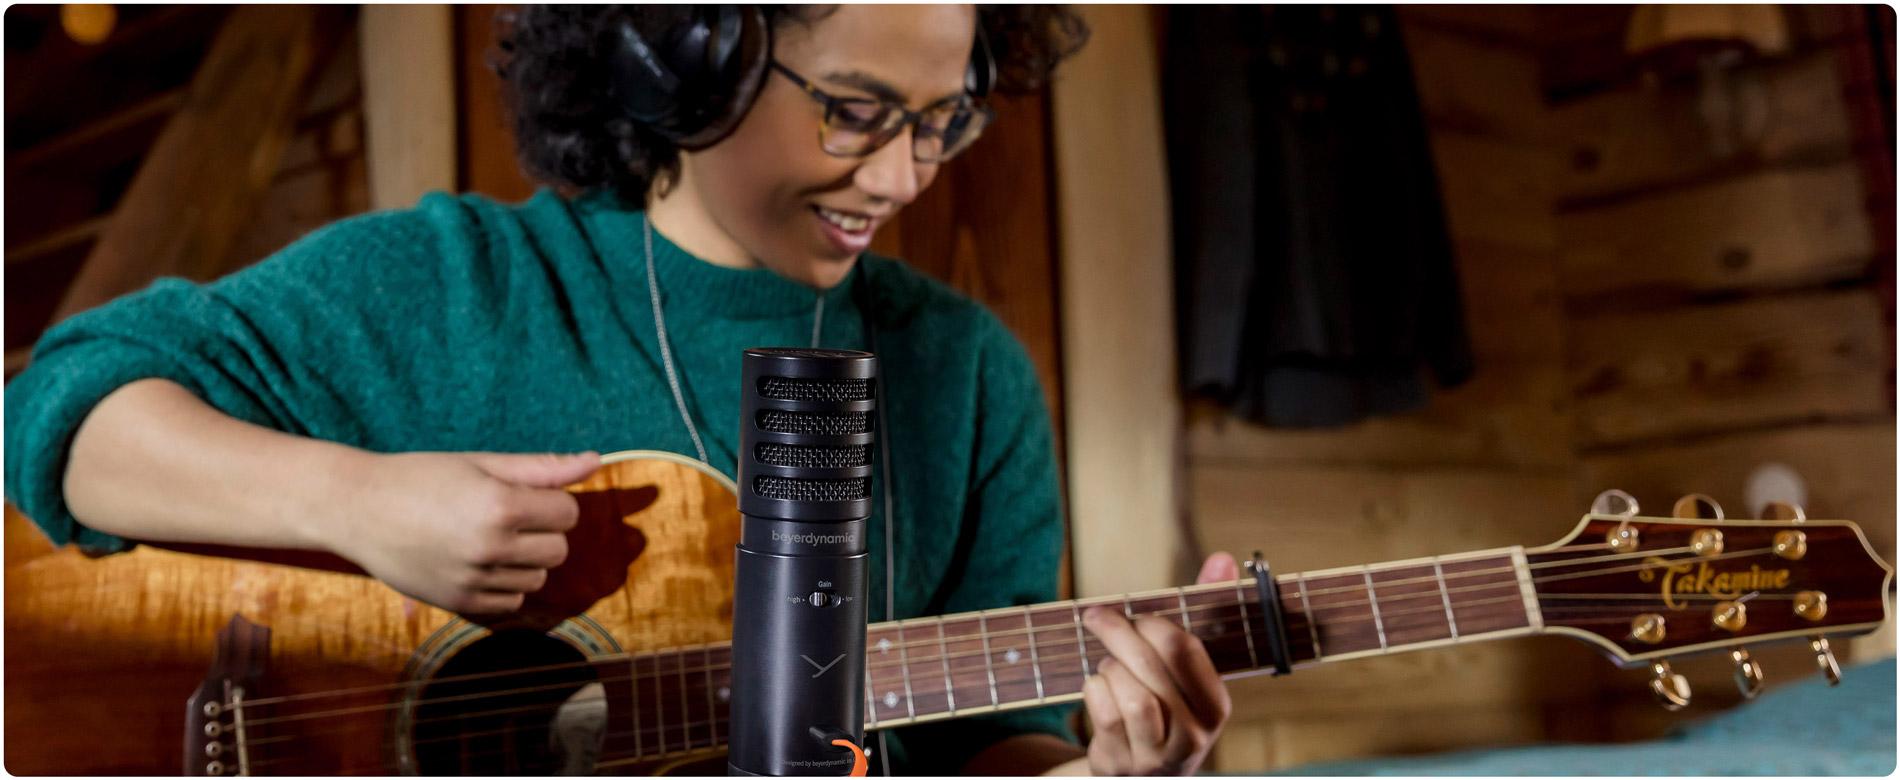 Beyerdynamic Fox USB Studio Microphone